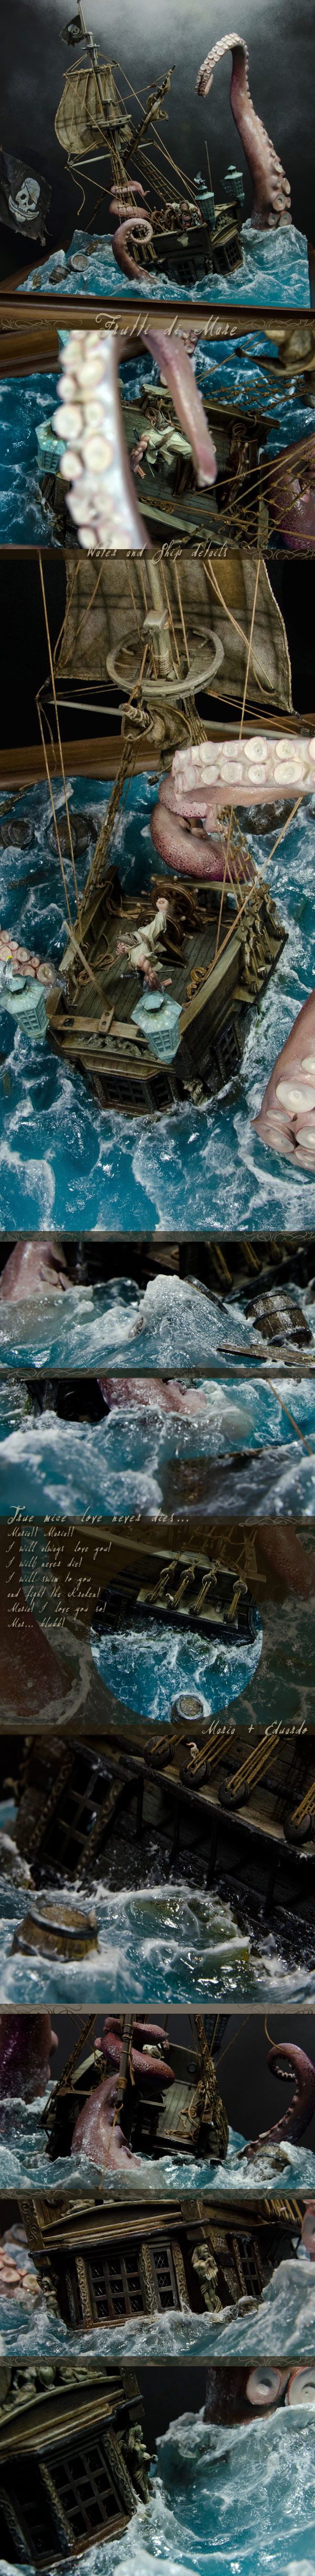 Frutti di Mare - Ship and water details